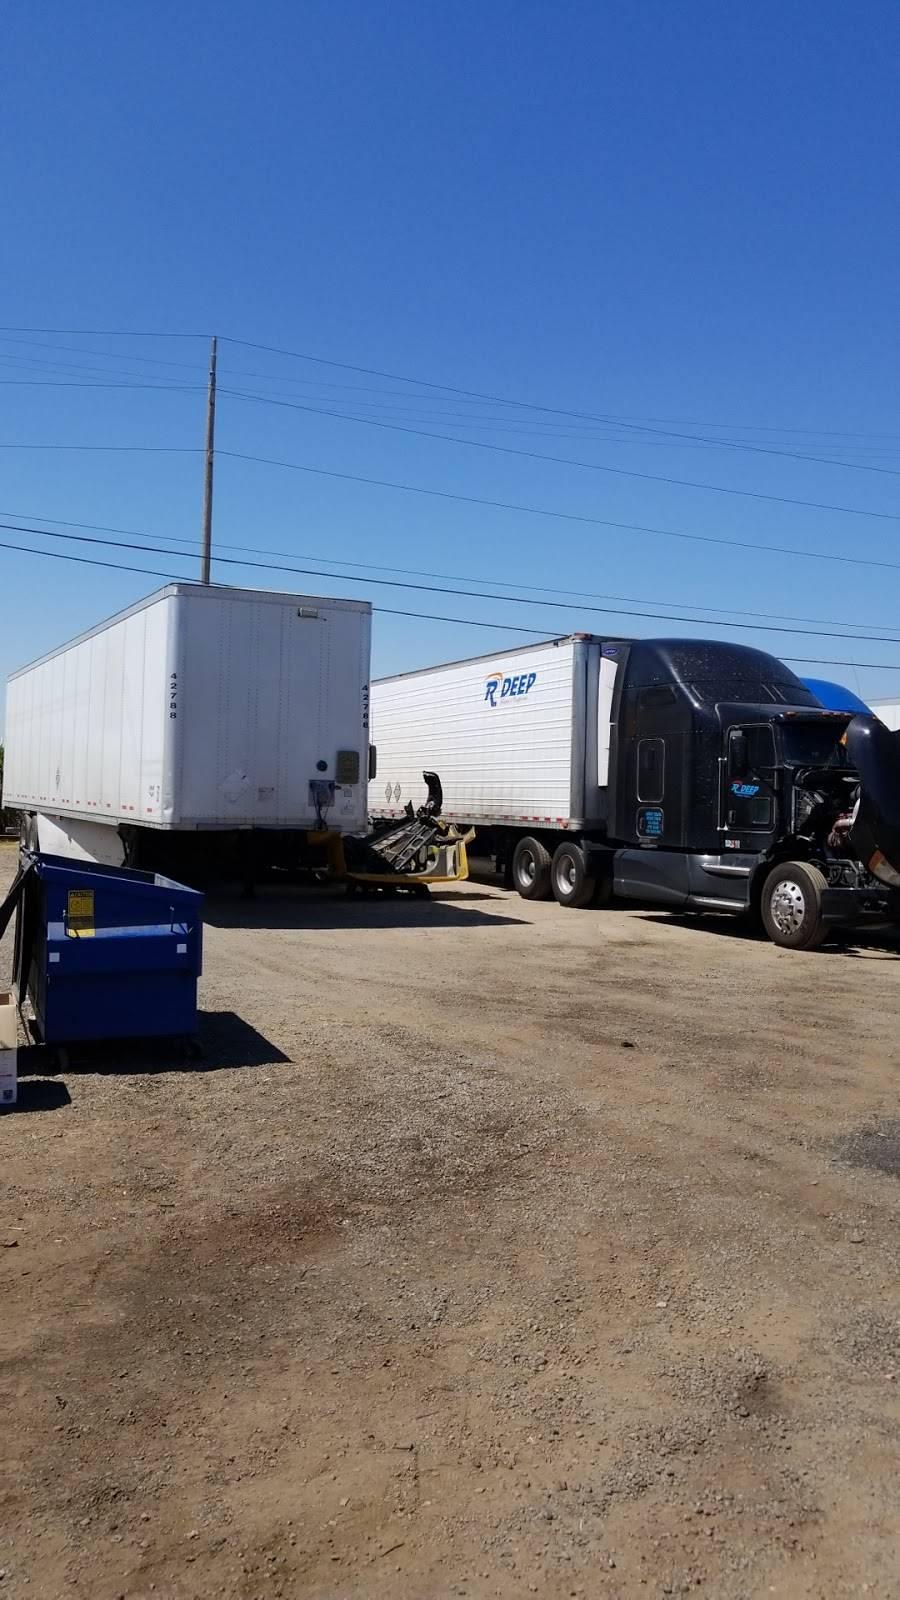 I5 Truck Trailer Repair - car repair  | Photo 2 of 5 | Address: Lathrop, CA 95330, USA | Phone: (510) 589-3811